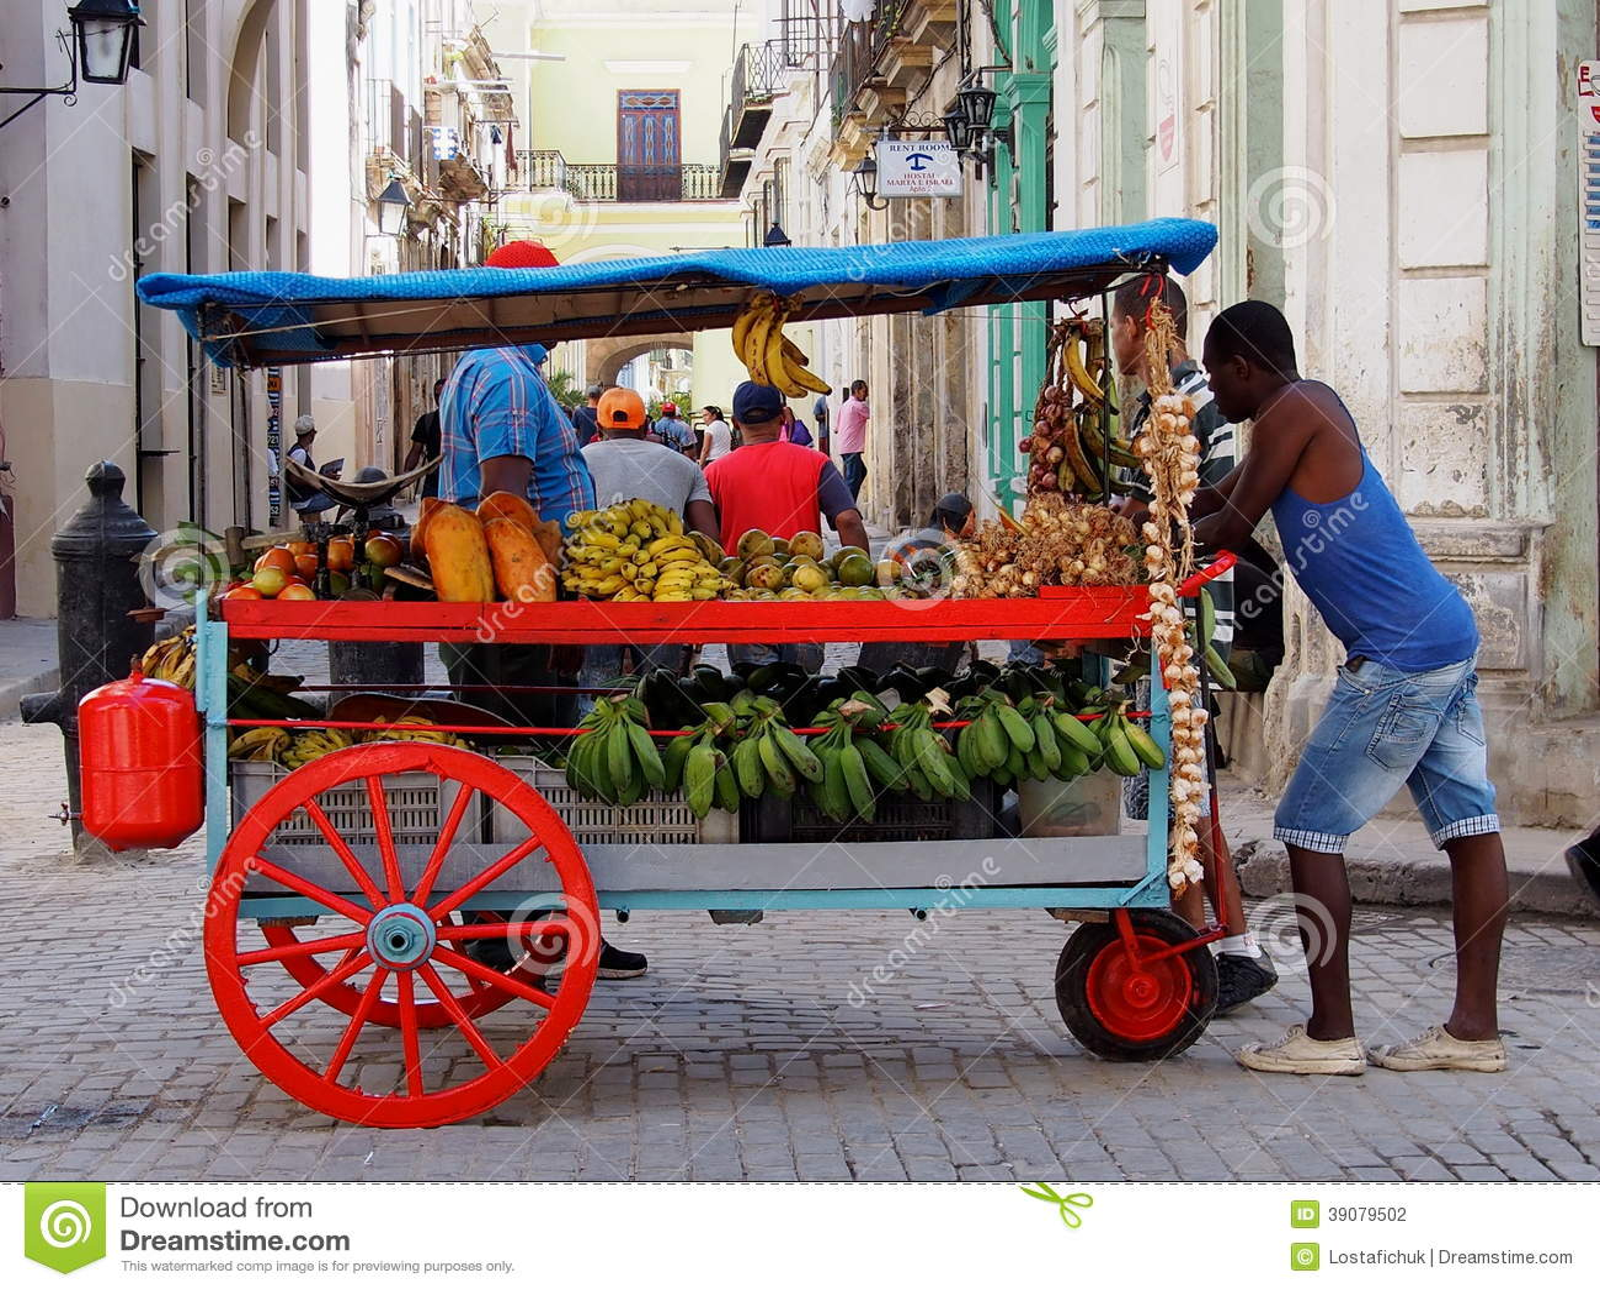 Gesichter des Kuba-Frucht-Warenkorb-Verkäufers